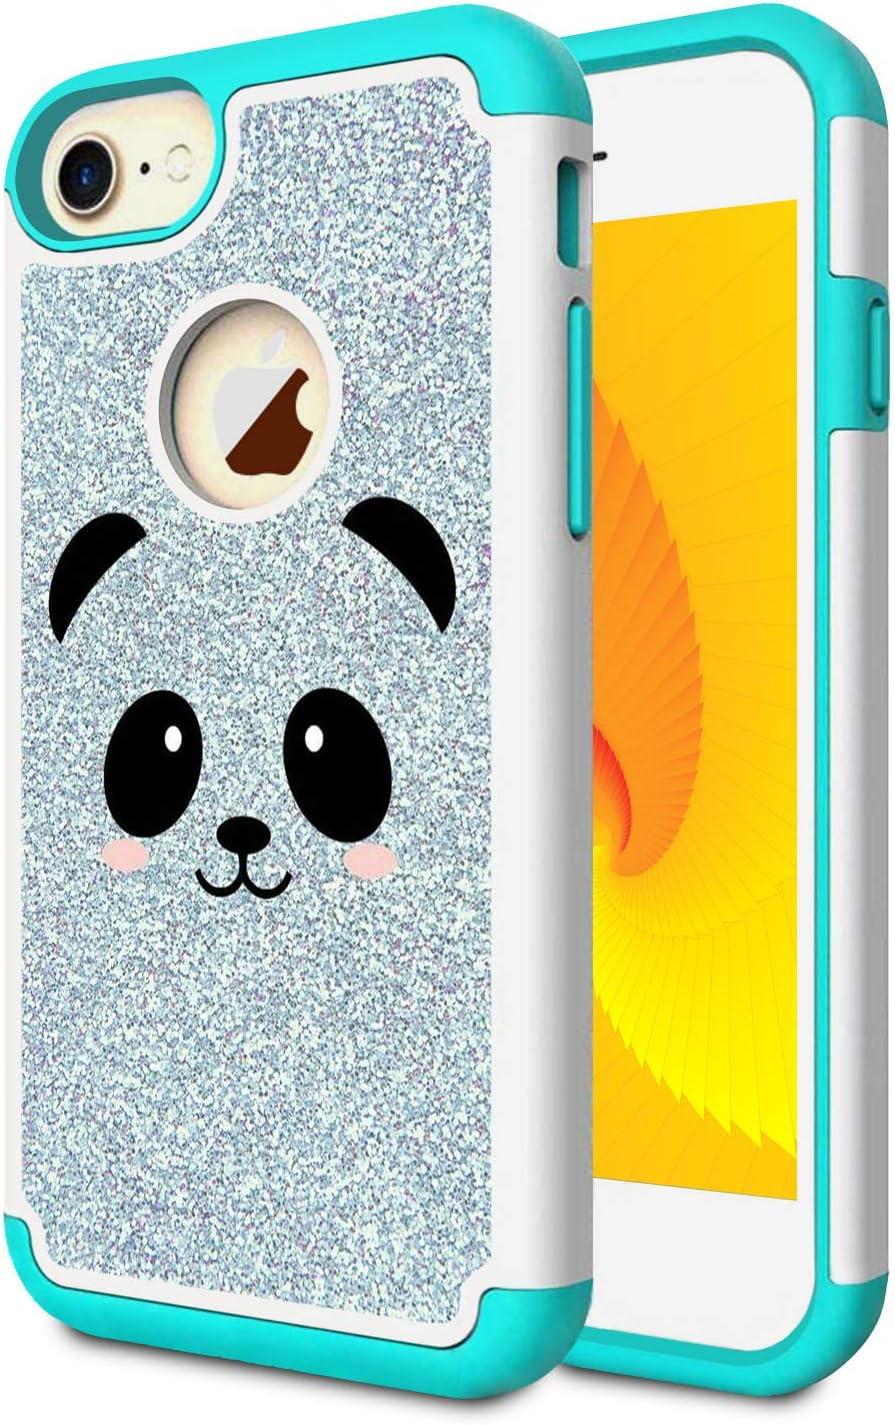 iPhone 7 Case, iPhone 8 Case, Skyfree Shockproof Heavy Duty Protection Hard PC & Soft TPU Hybrid Dual Layer Protective Phone Case for Apple iPhone 7/iPhone 8,Cute Panda Face